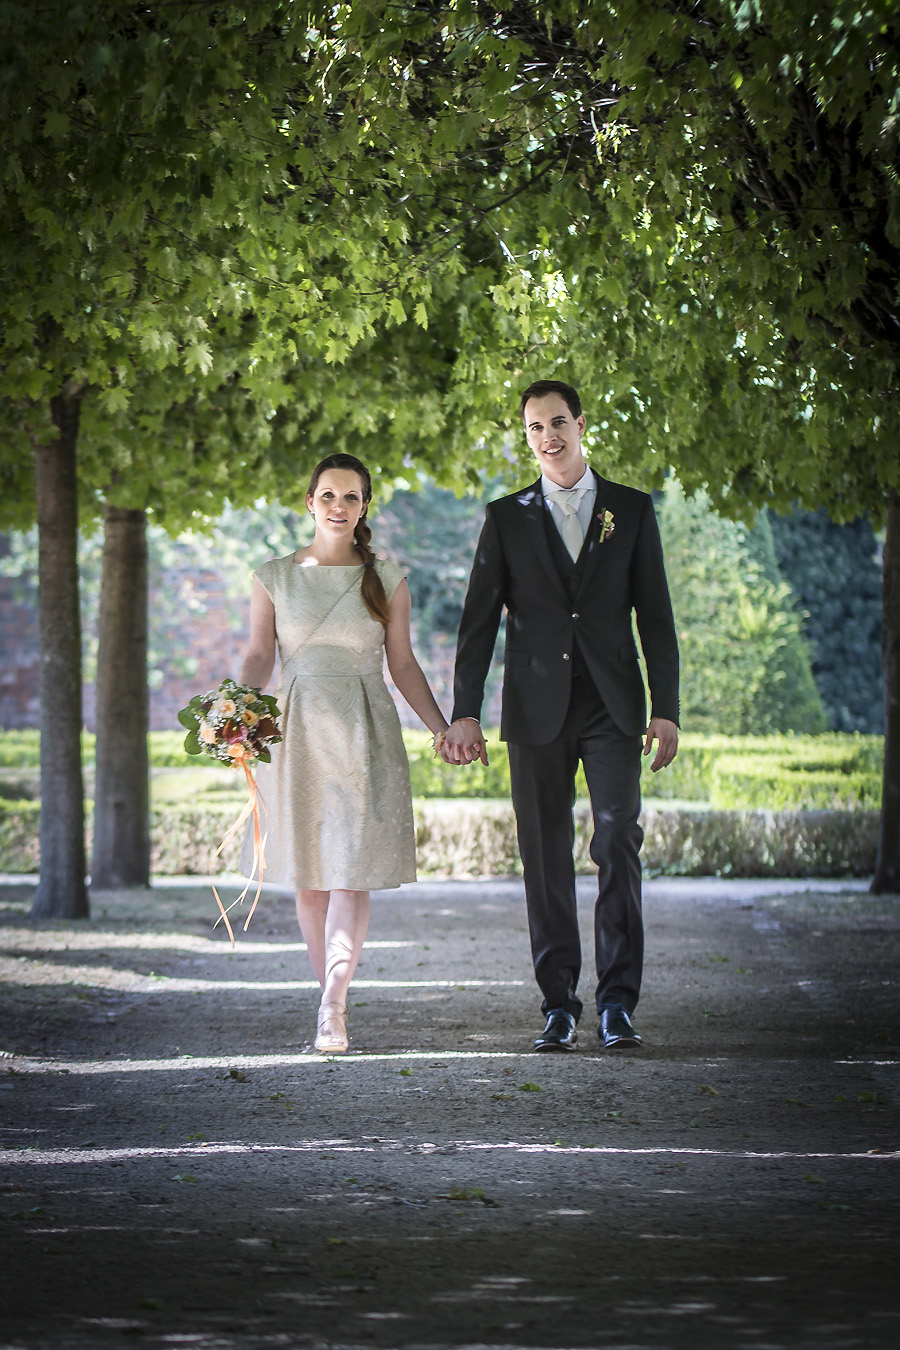 Brautpaarfotos Delitzsch